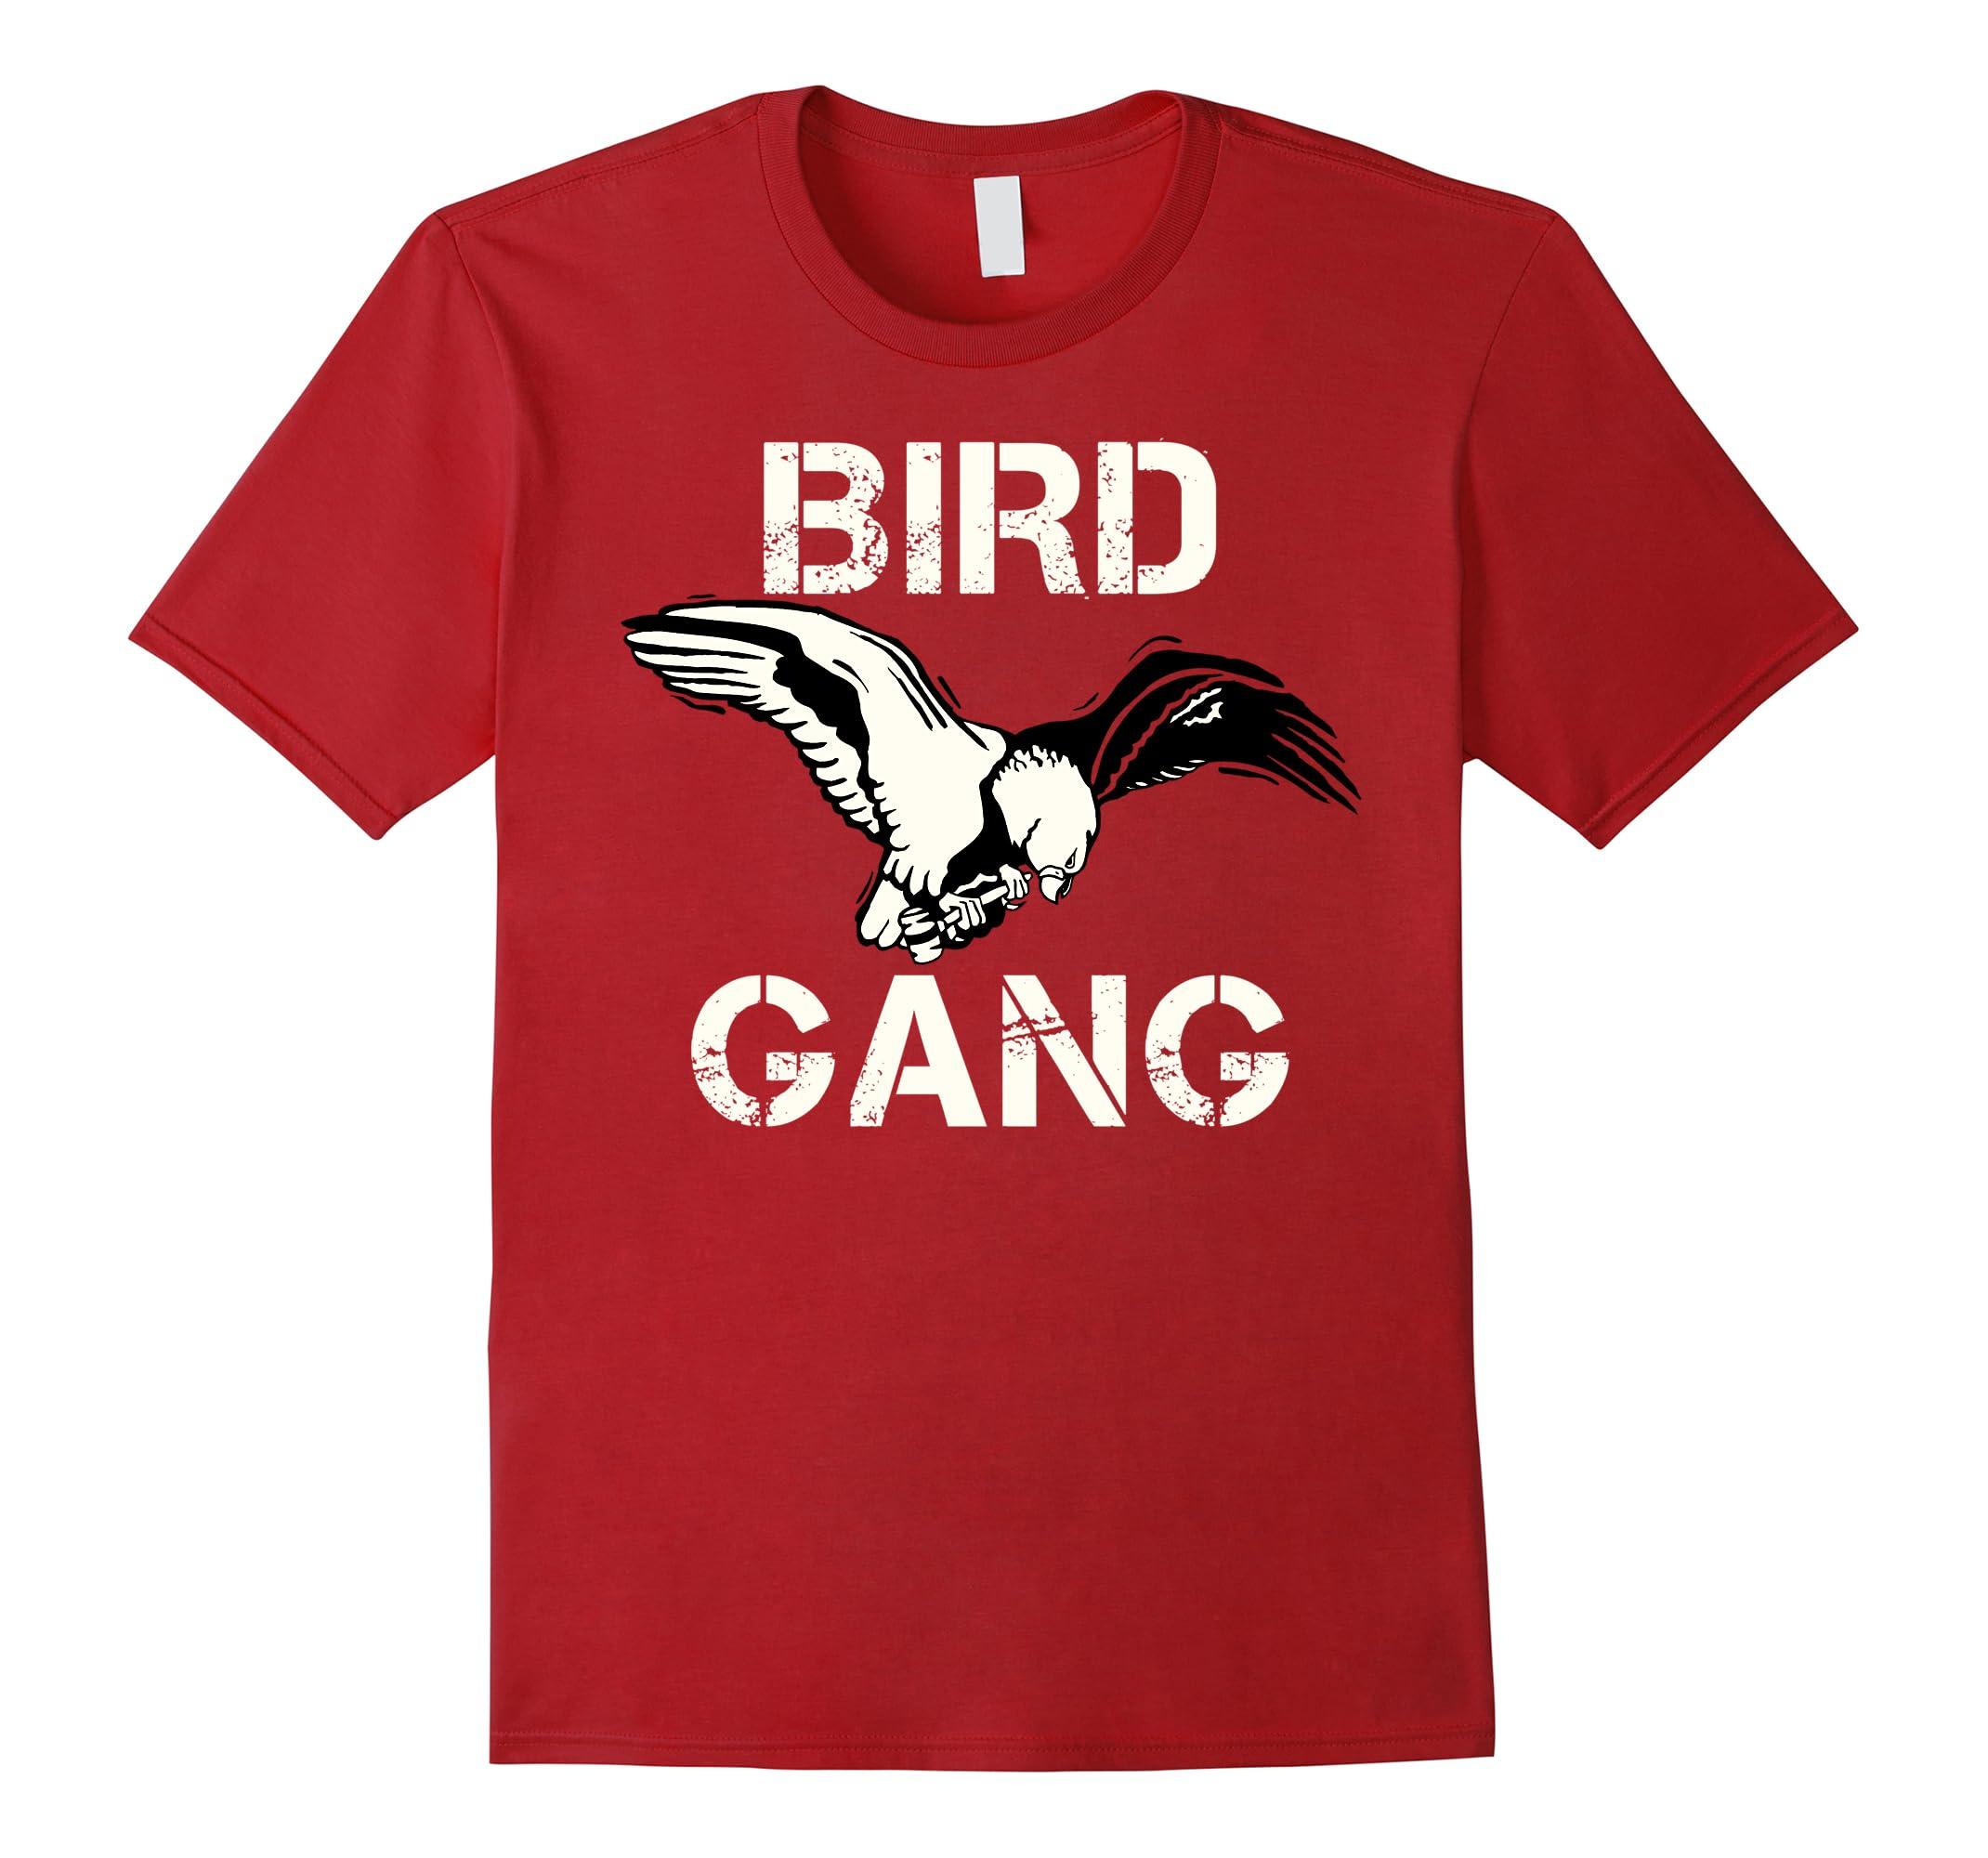 Bird Gang Eagle Tee Shirt Philadelphia Philly Football-ah my shirt one gift